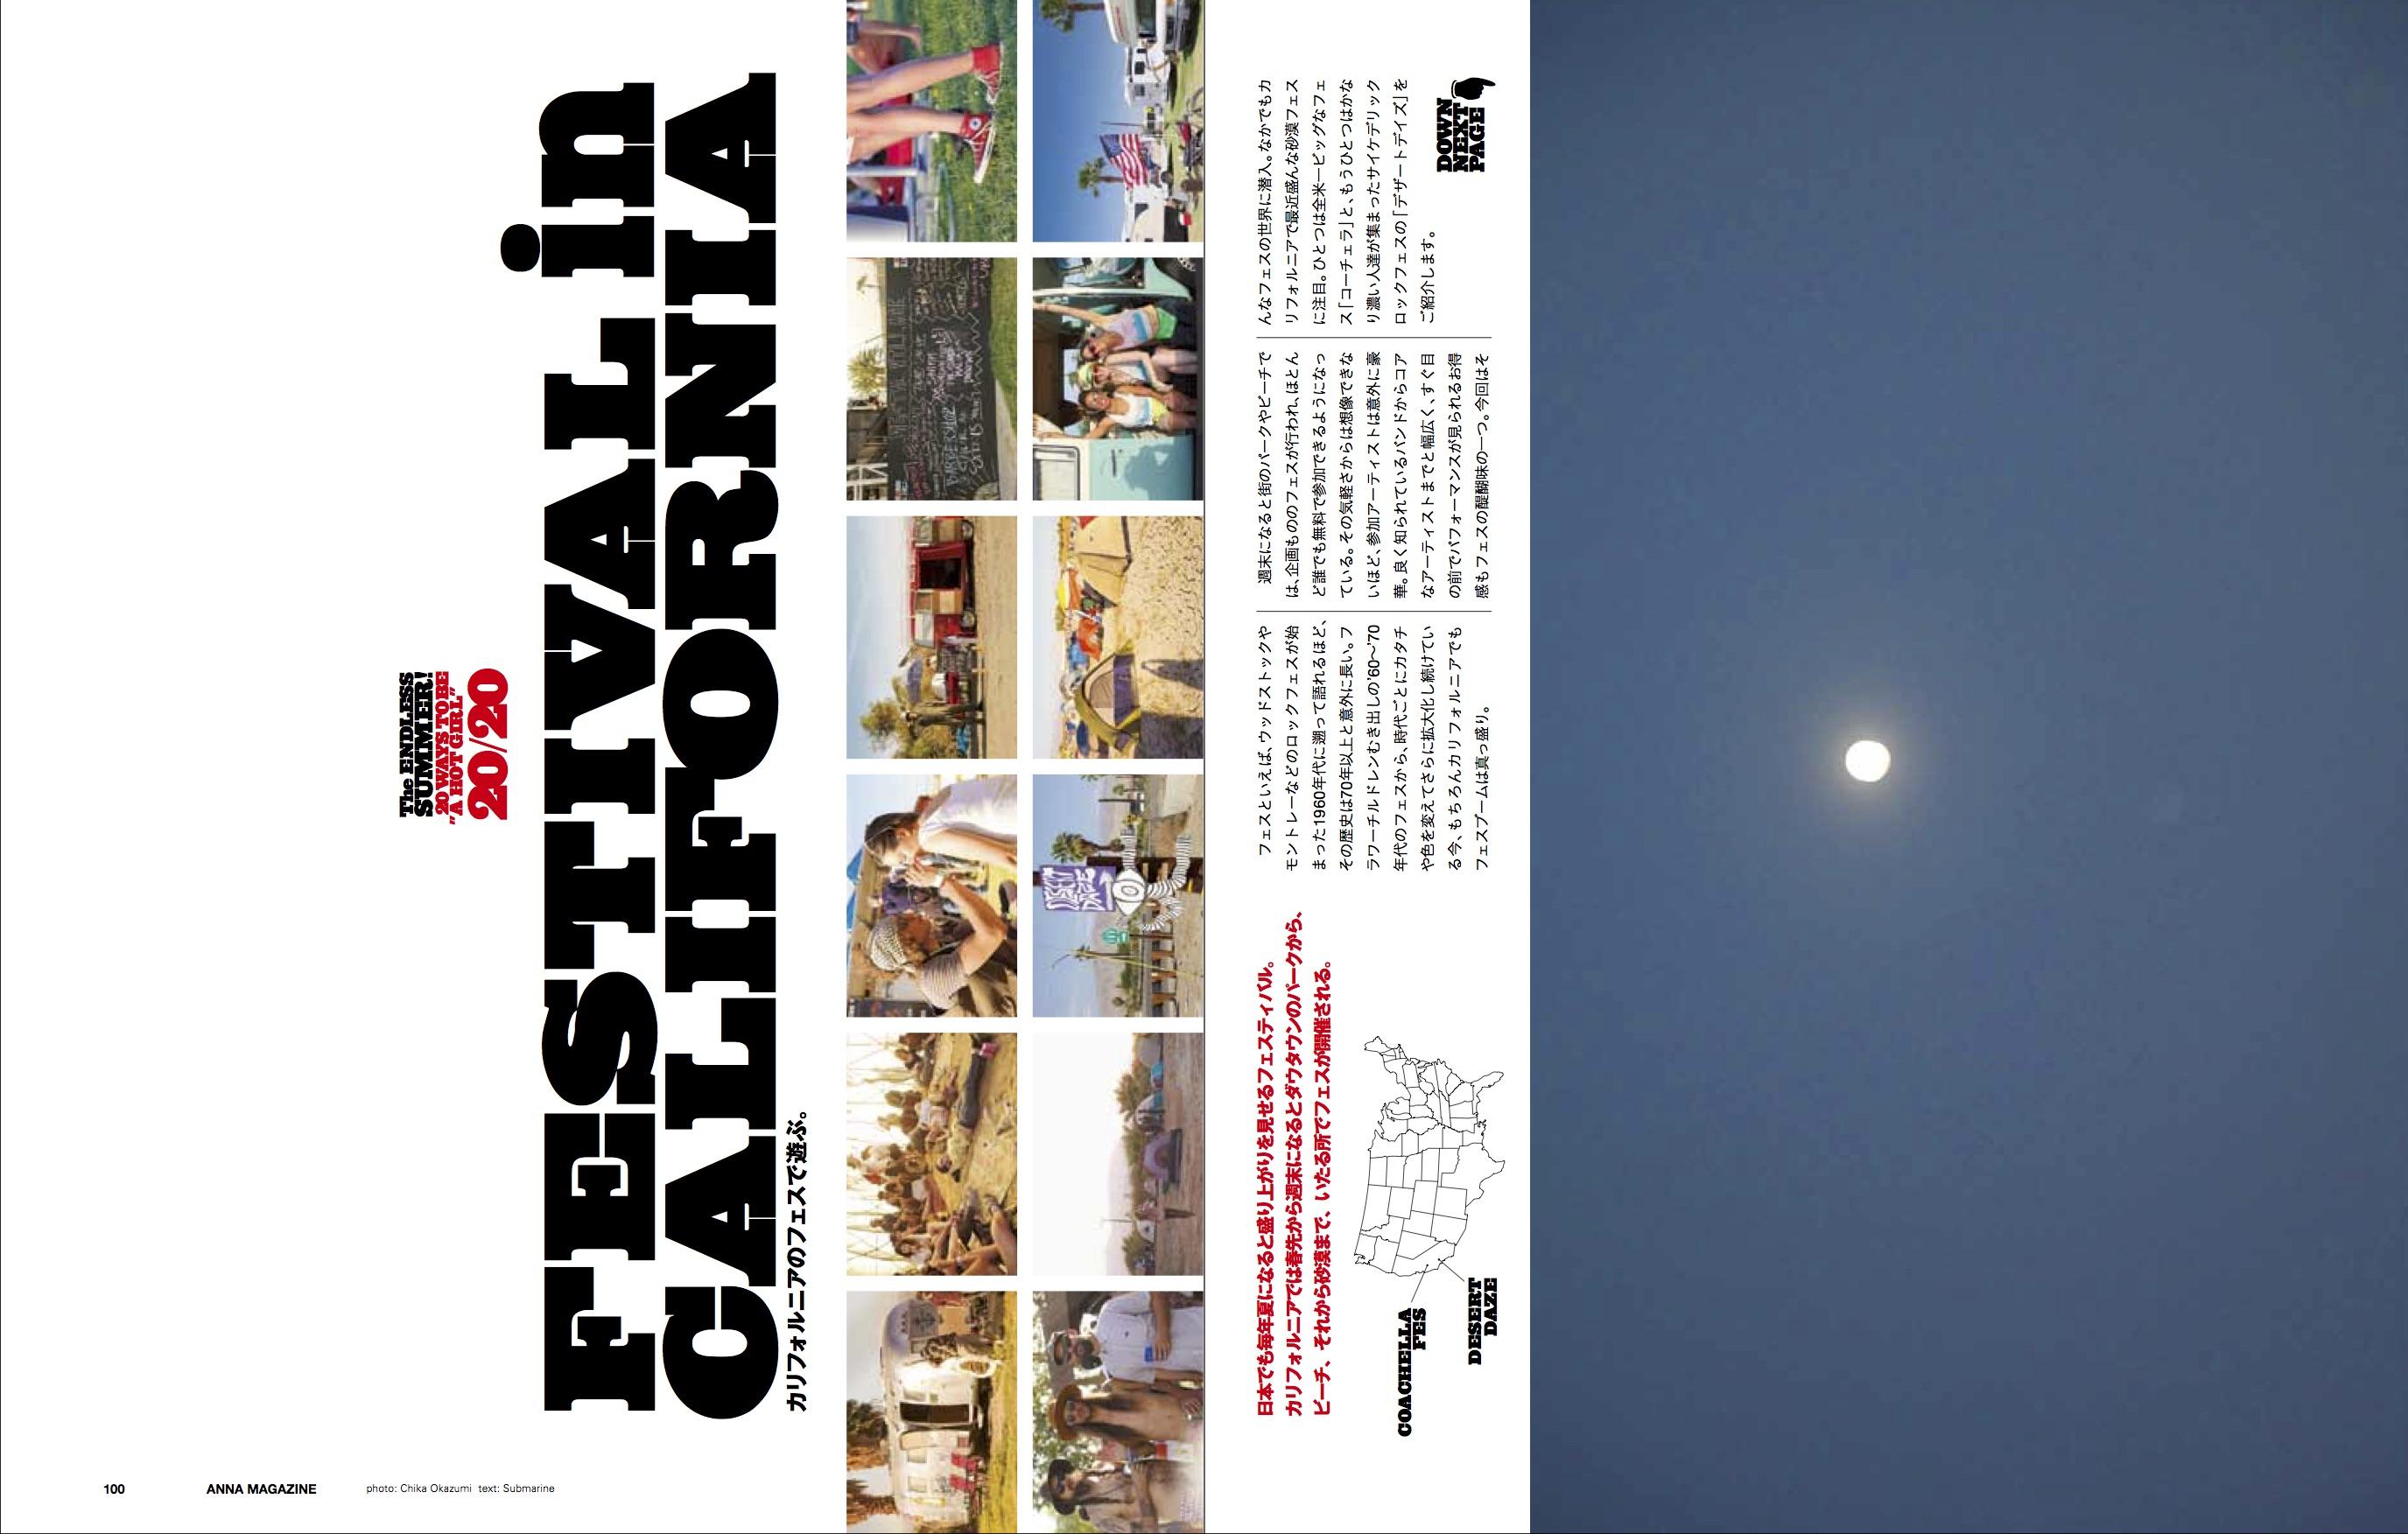 anna magazine Vol.3 P28